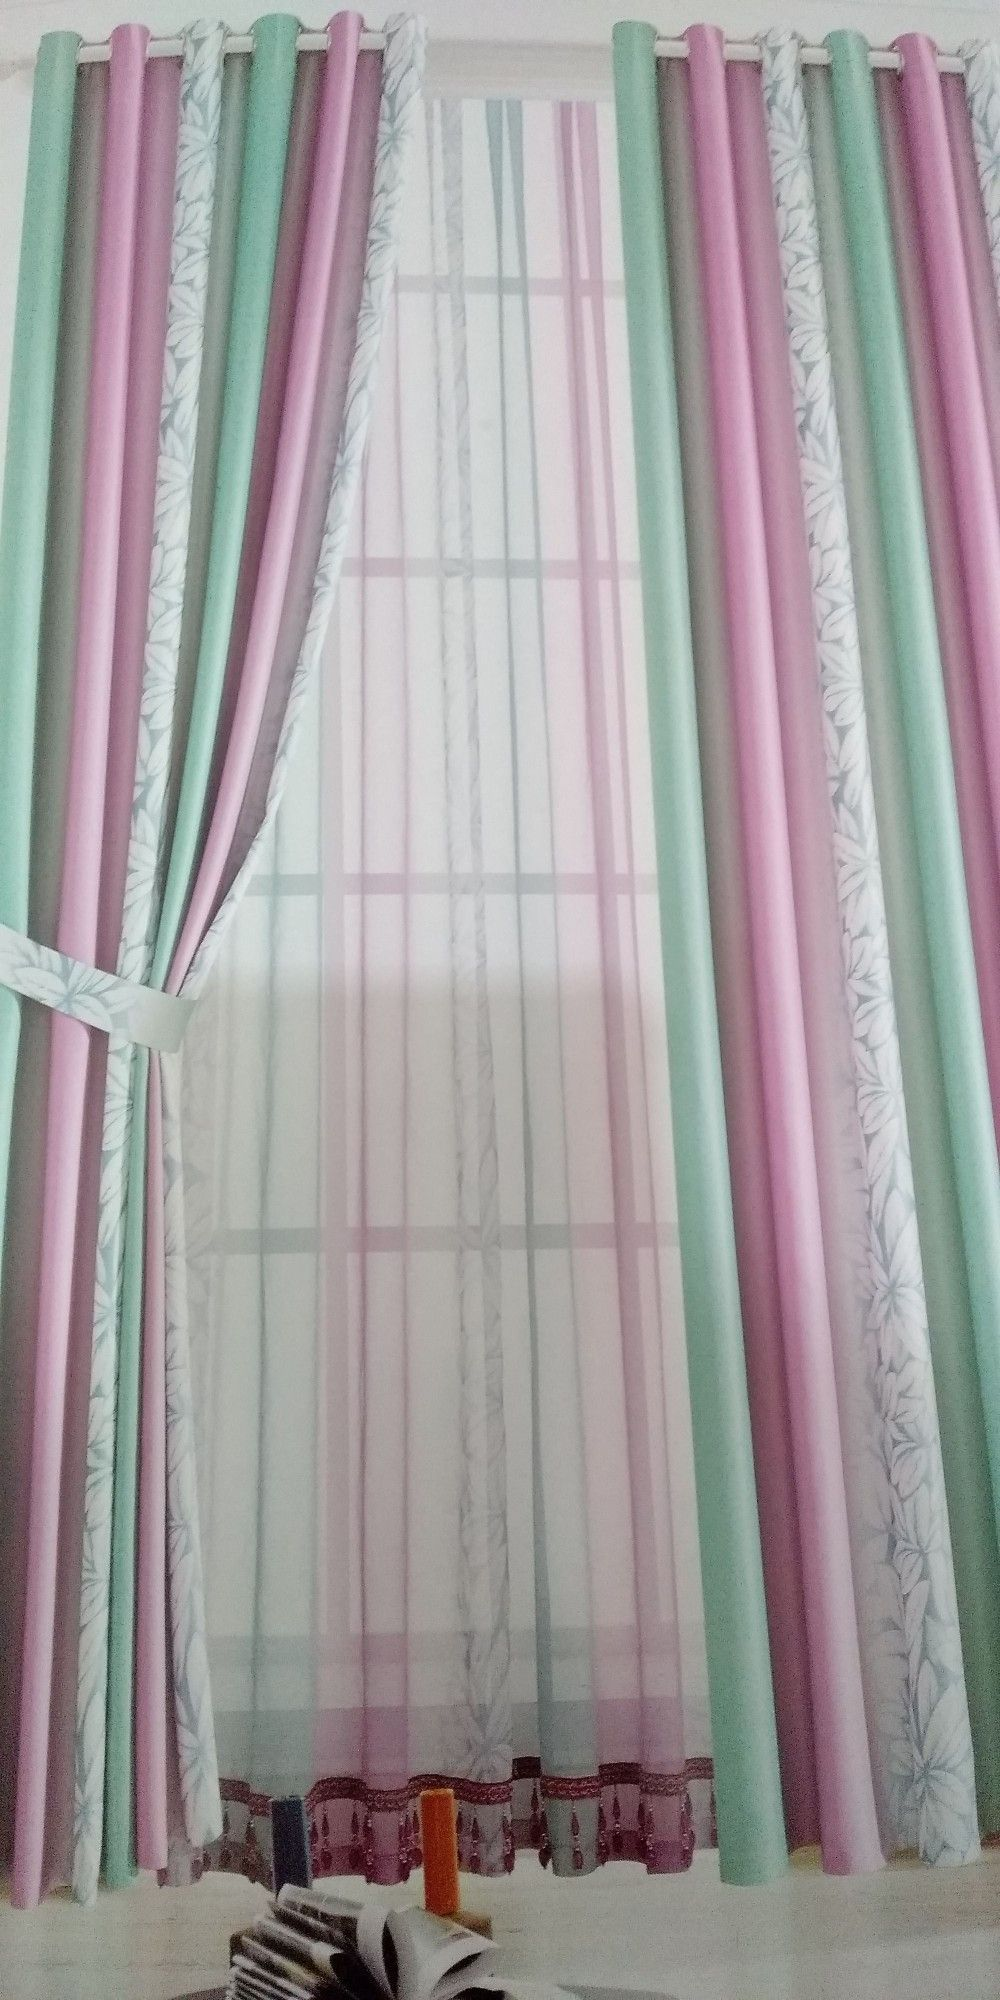 Dekorasi Gordyn Minimalis Gorden Curtain Modern Surabaya